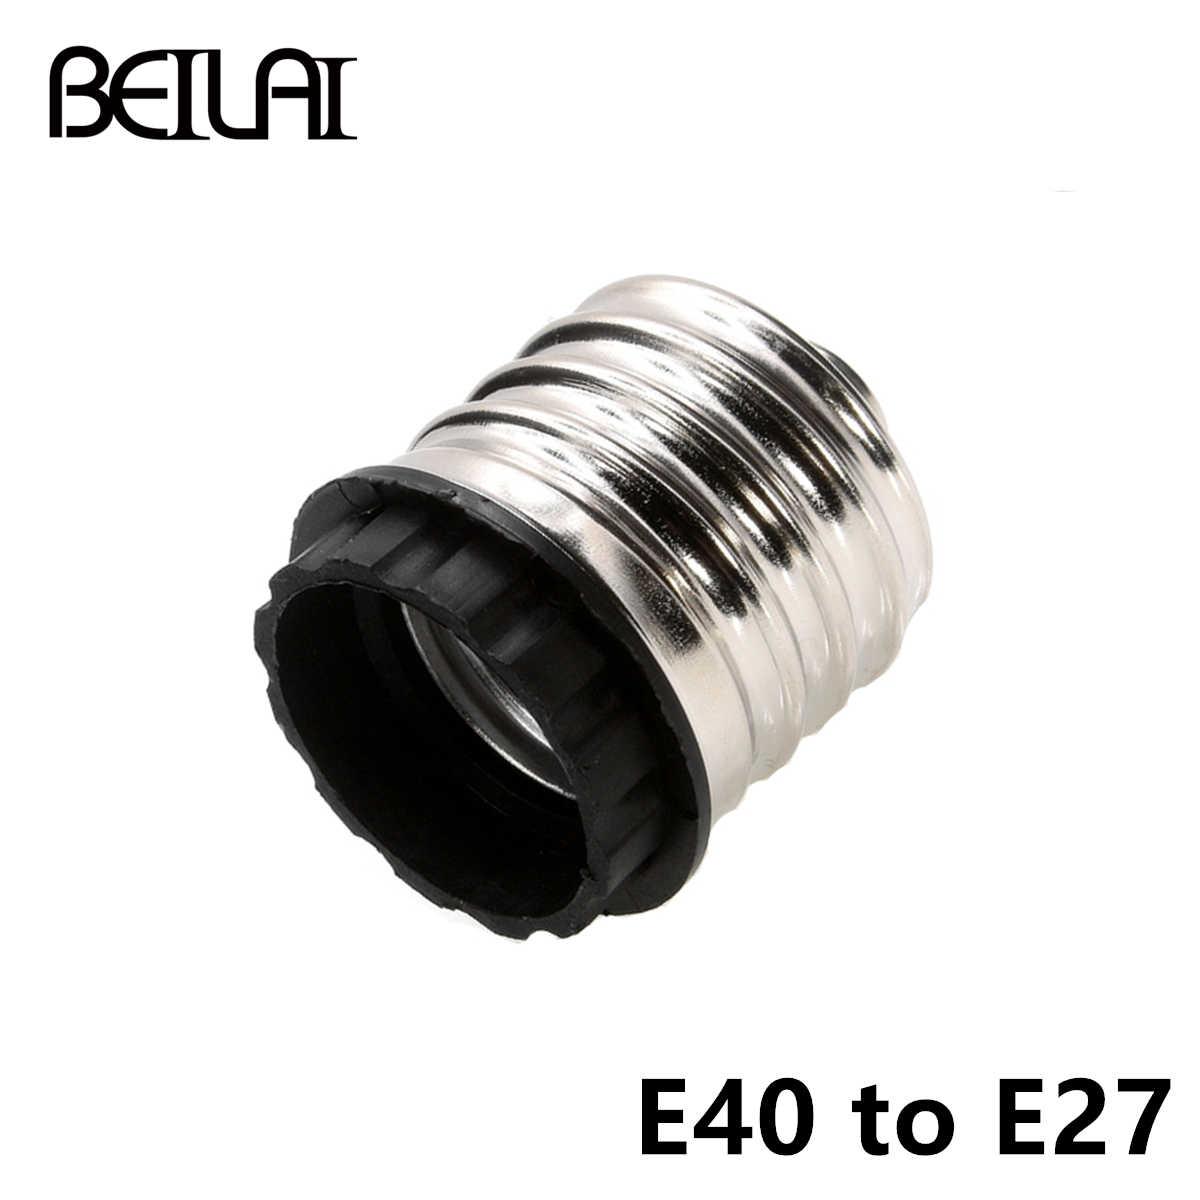 2 In 1 E27 Y Bentuk Lampu MR16 GU10 E14 B22 G9 Terial Pemegang Converter Soket Lampu Splitter Adaptor lampu Bulb Base Pemegang